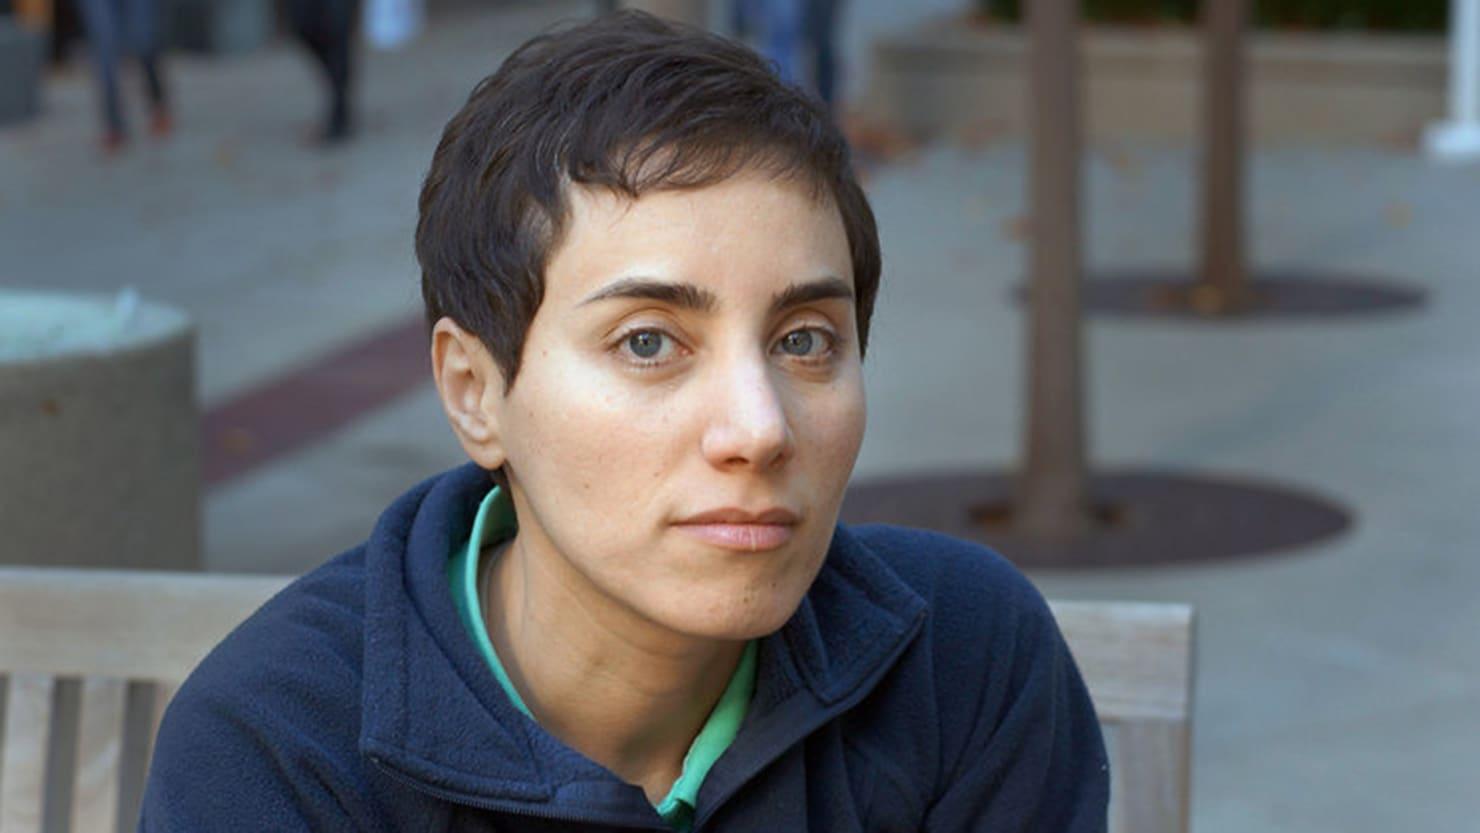 Iran Photoshops a Veil on Its Deceased Math Genius Maryam Mirzakhani